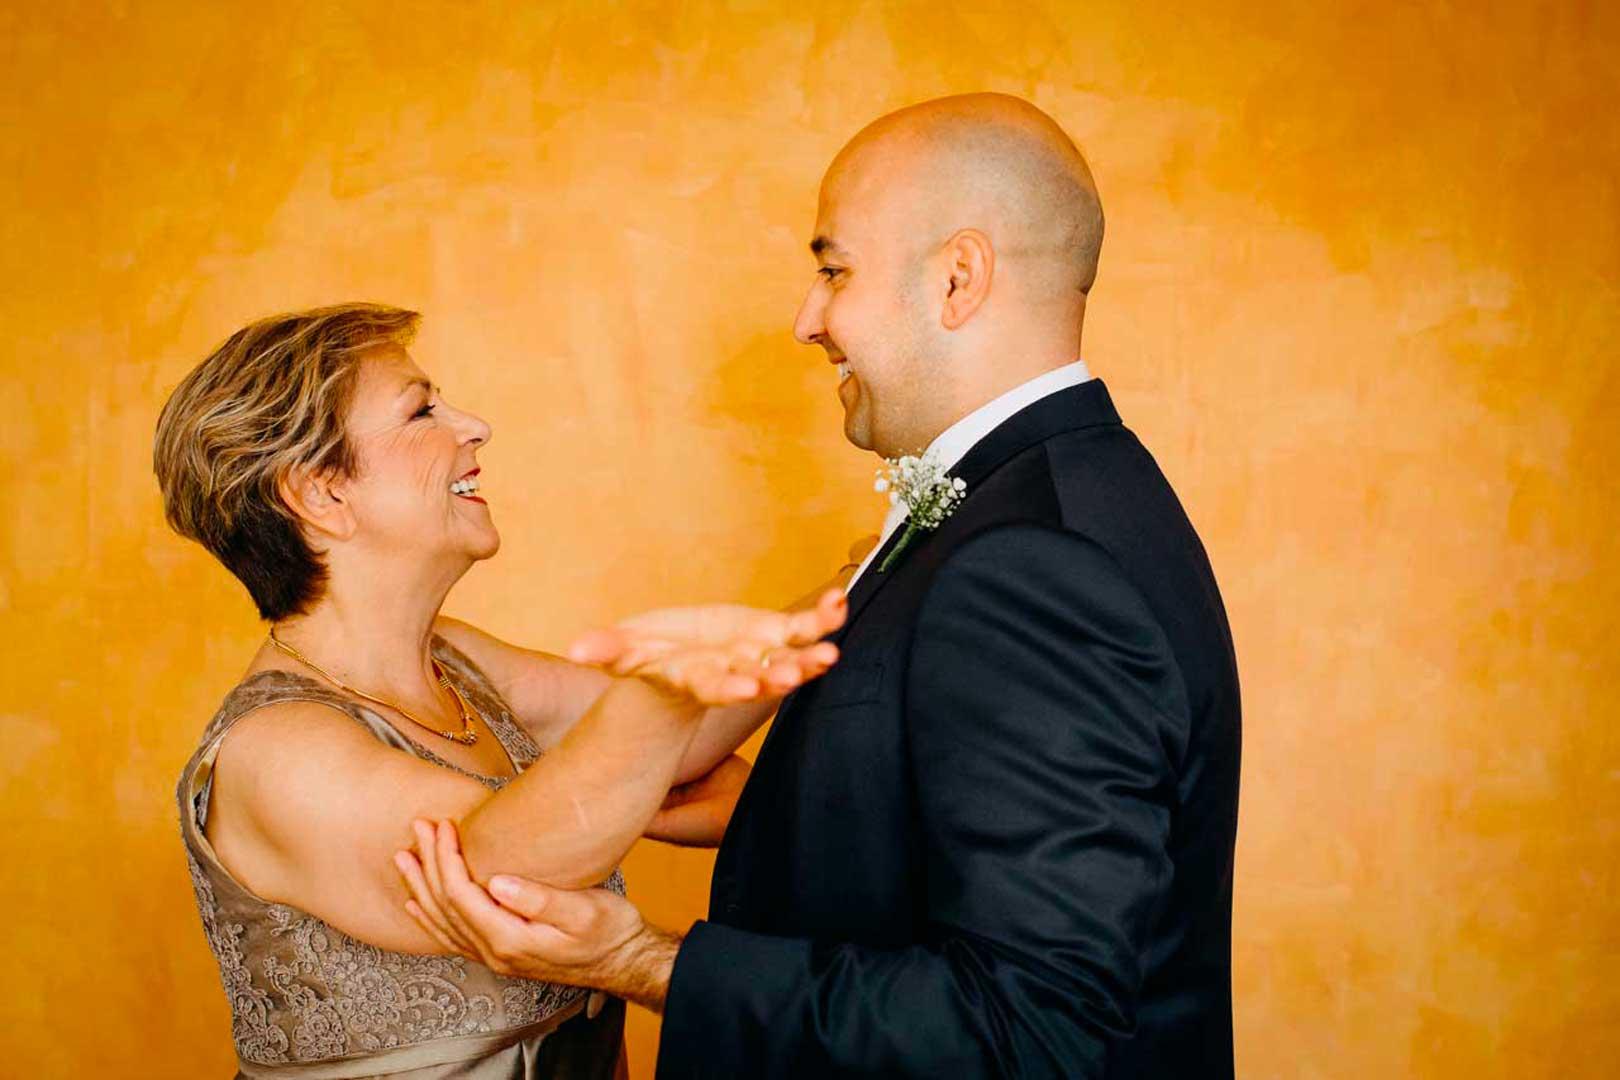 003-emozioni-matrimonio-gianni-lepore-fotografo